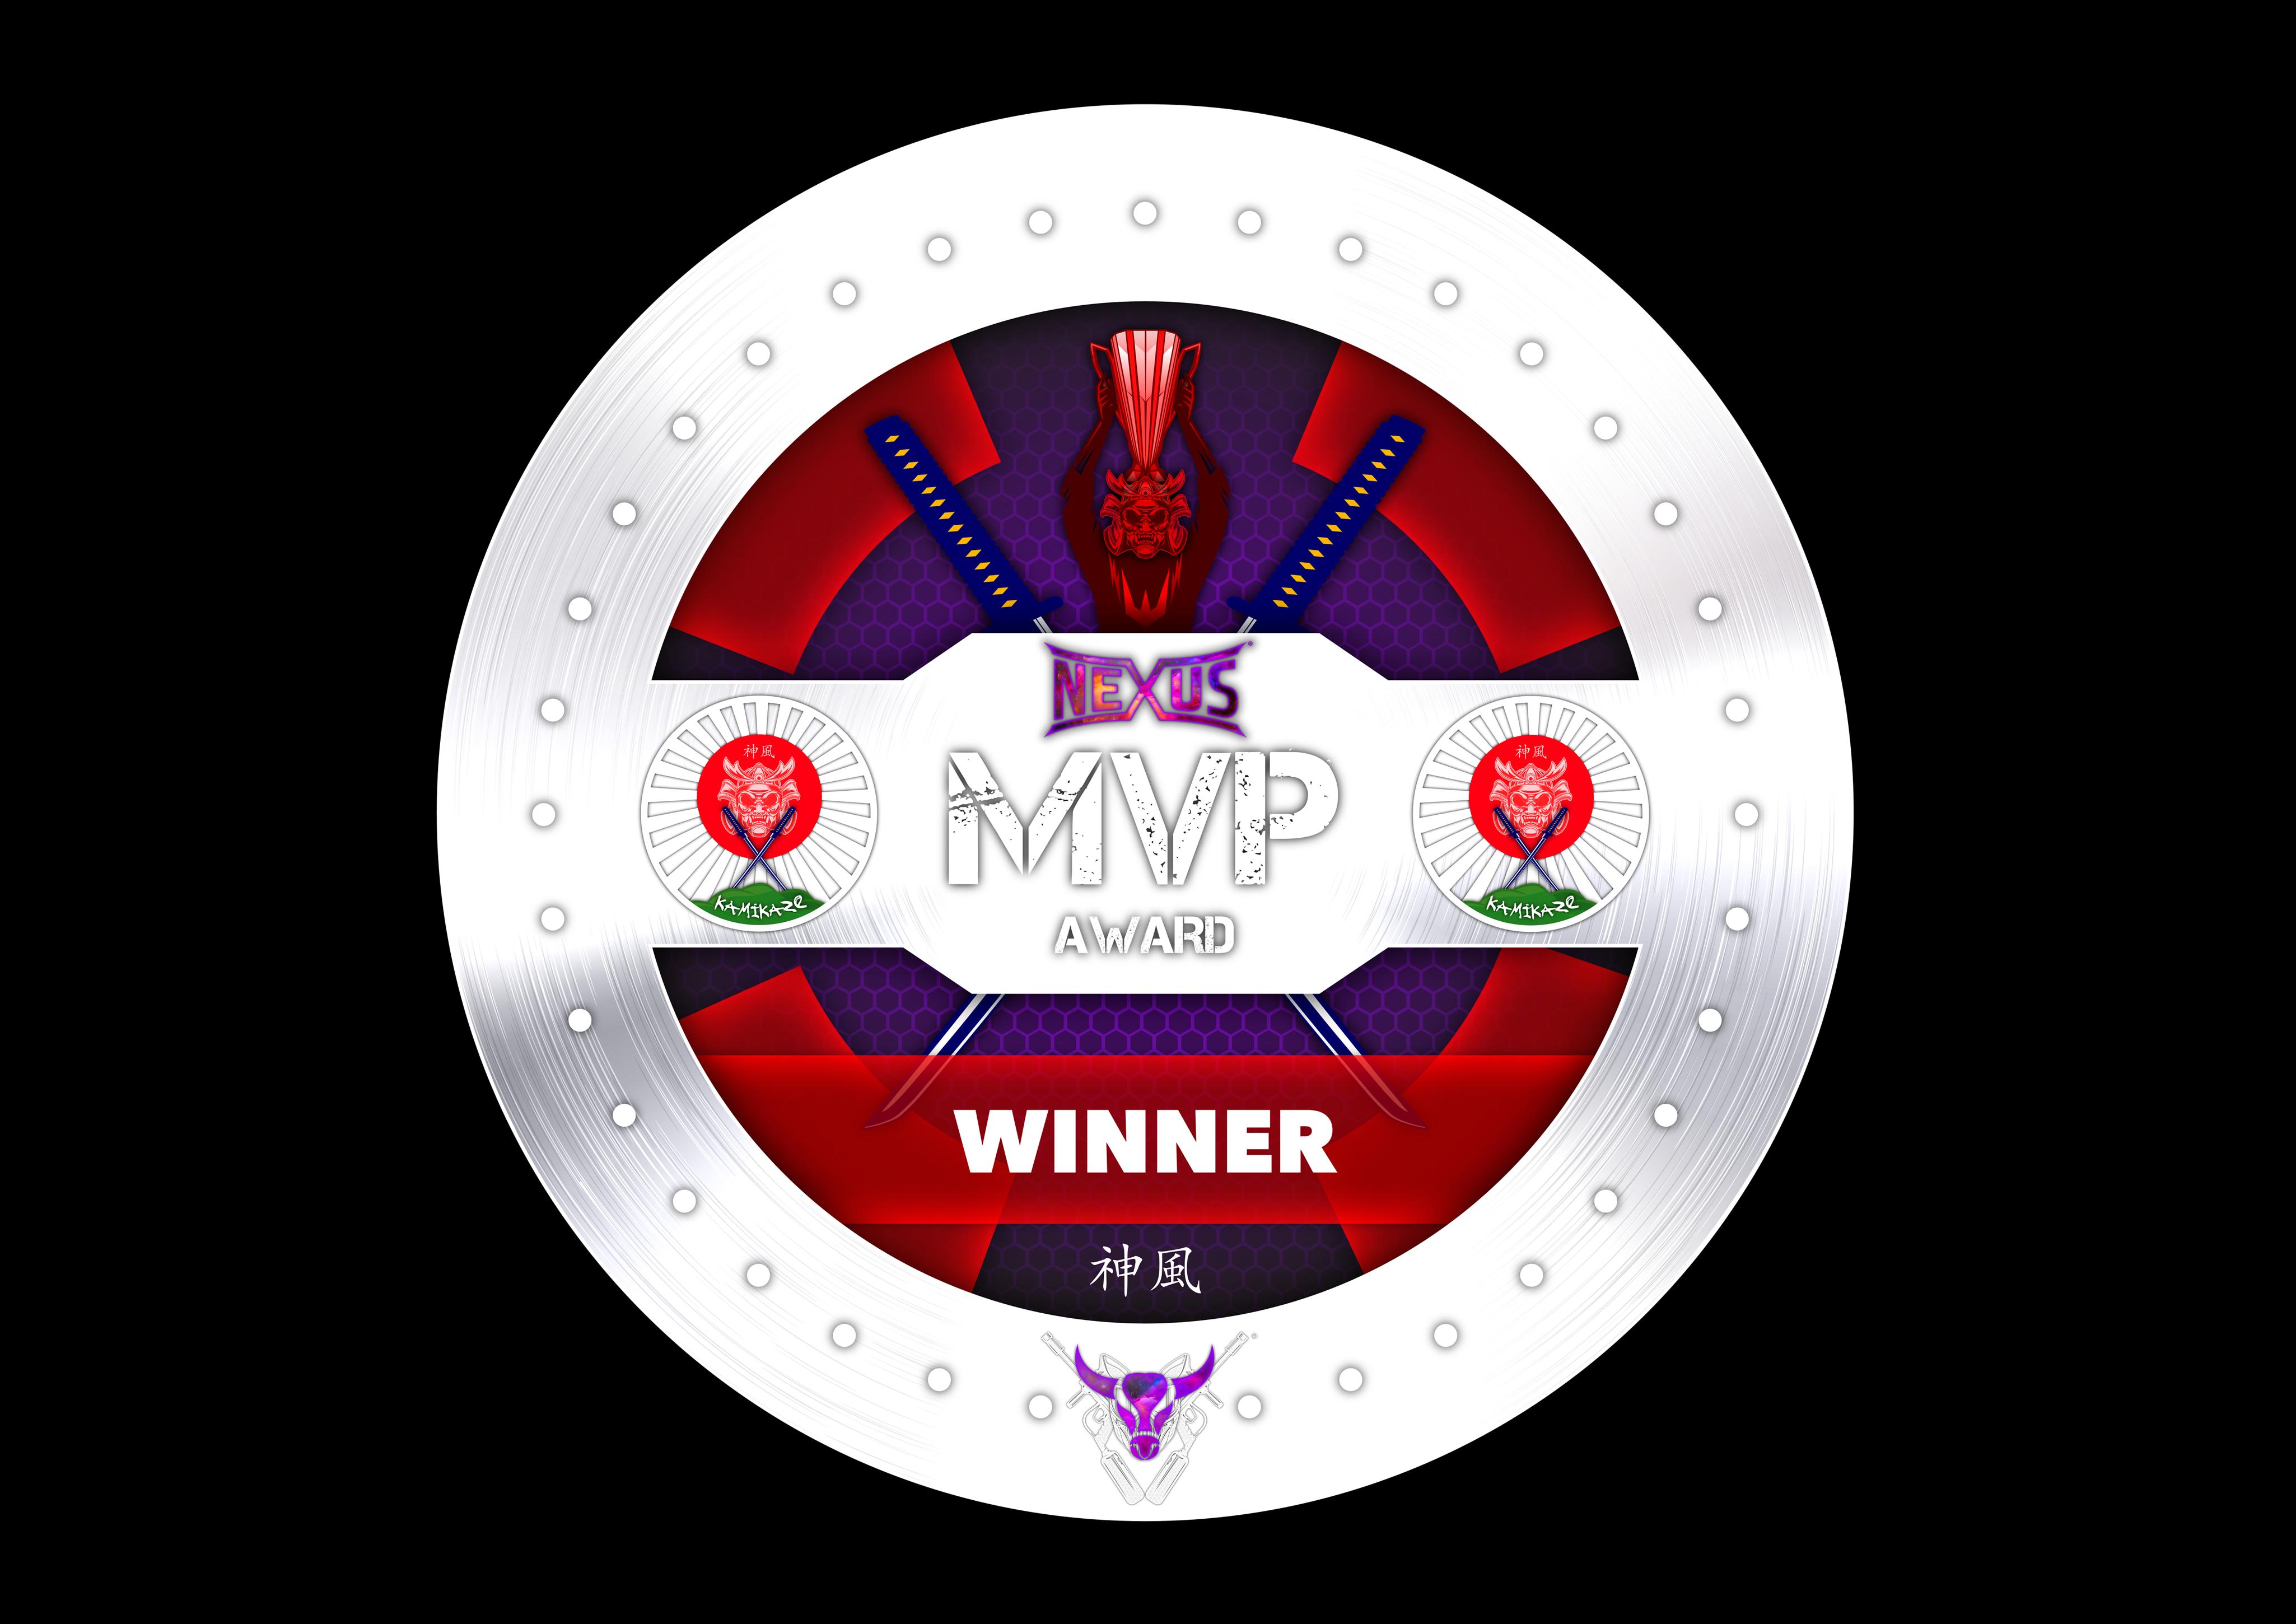 NEXUS Kamikaze MVP Award